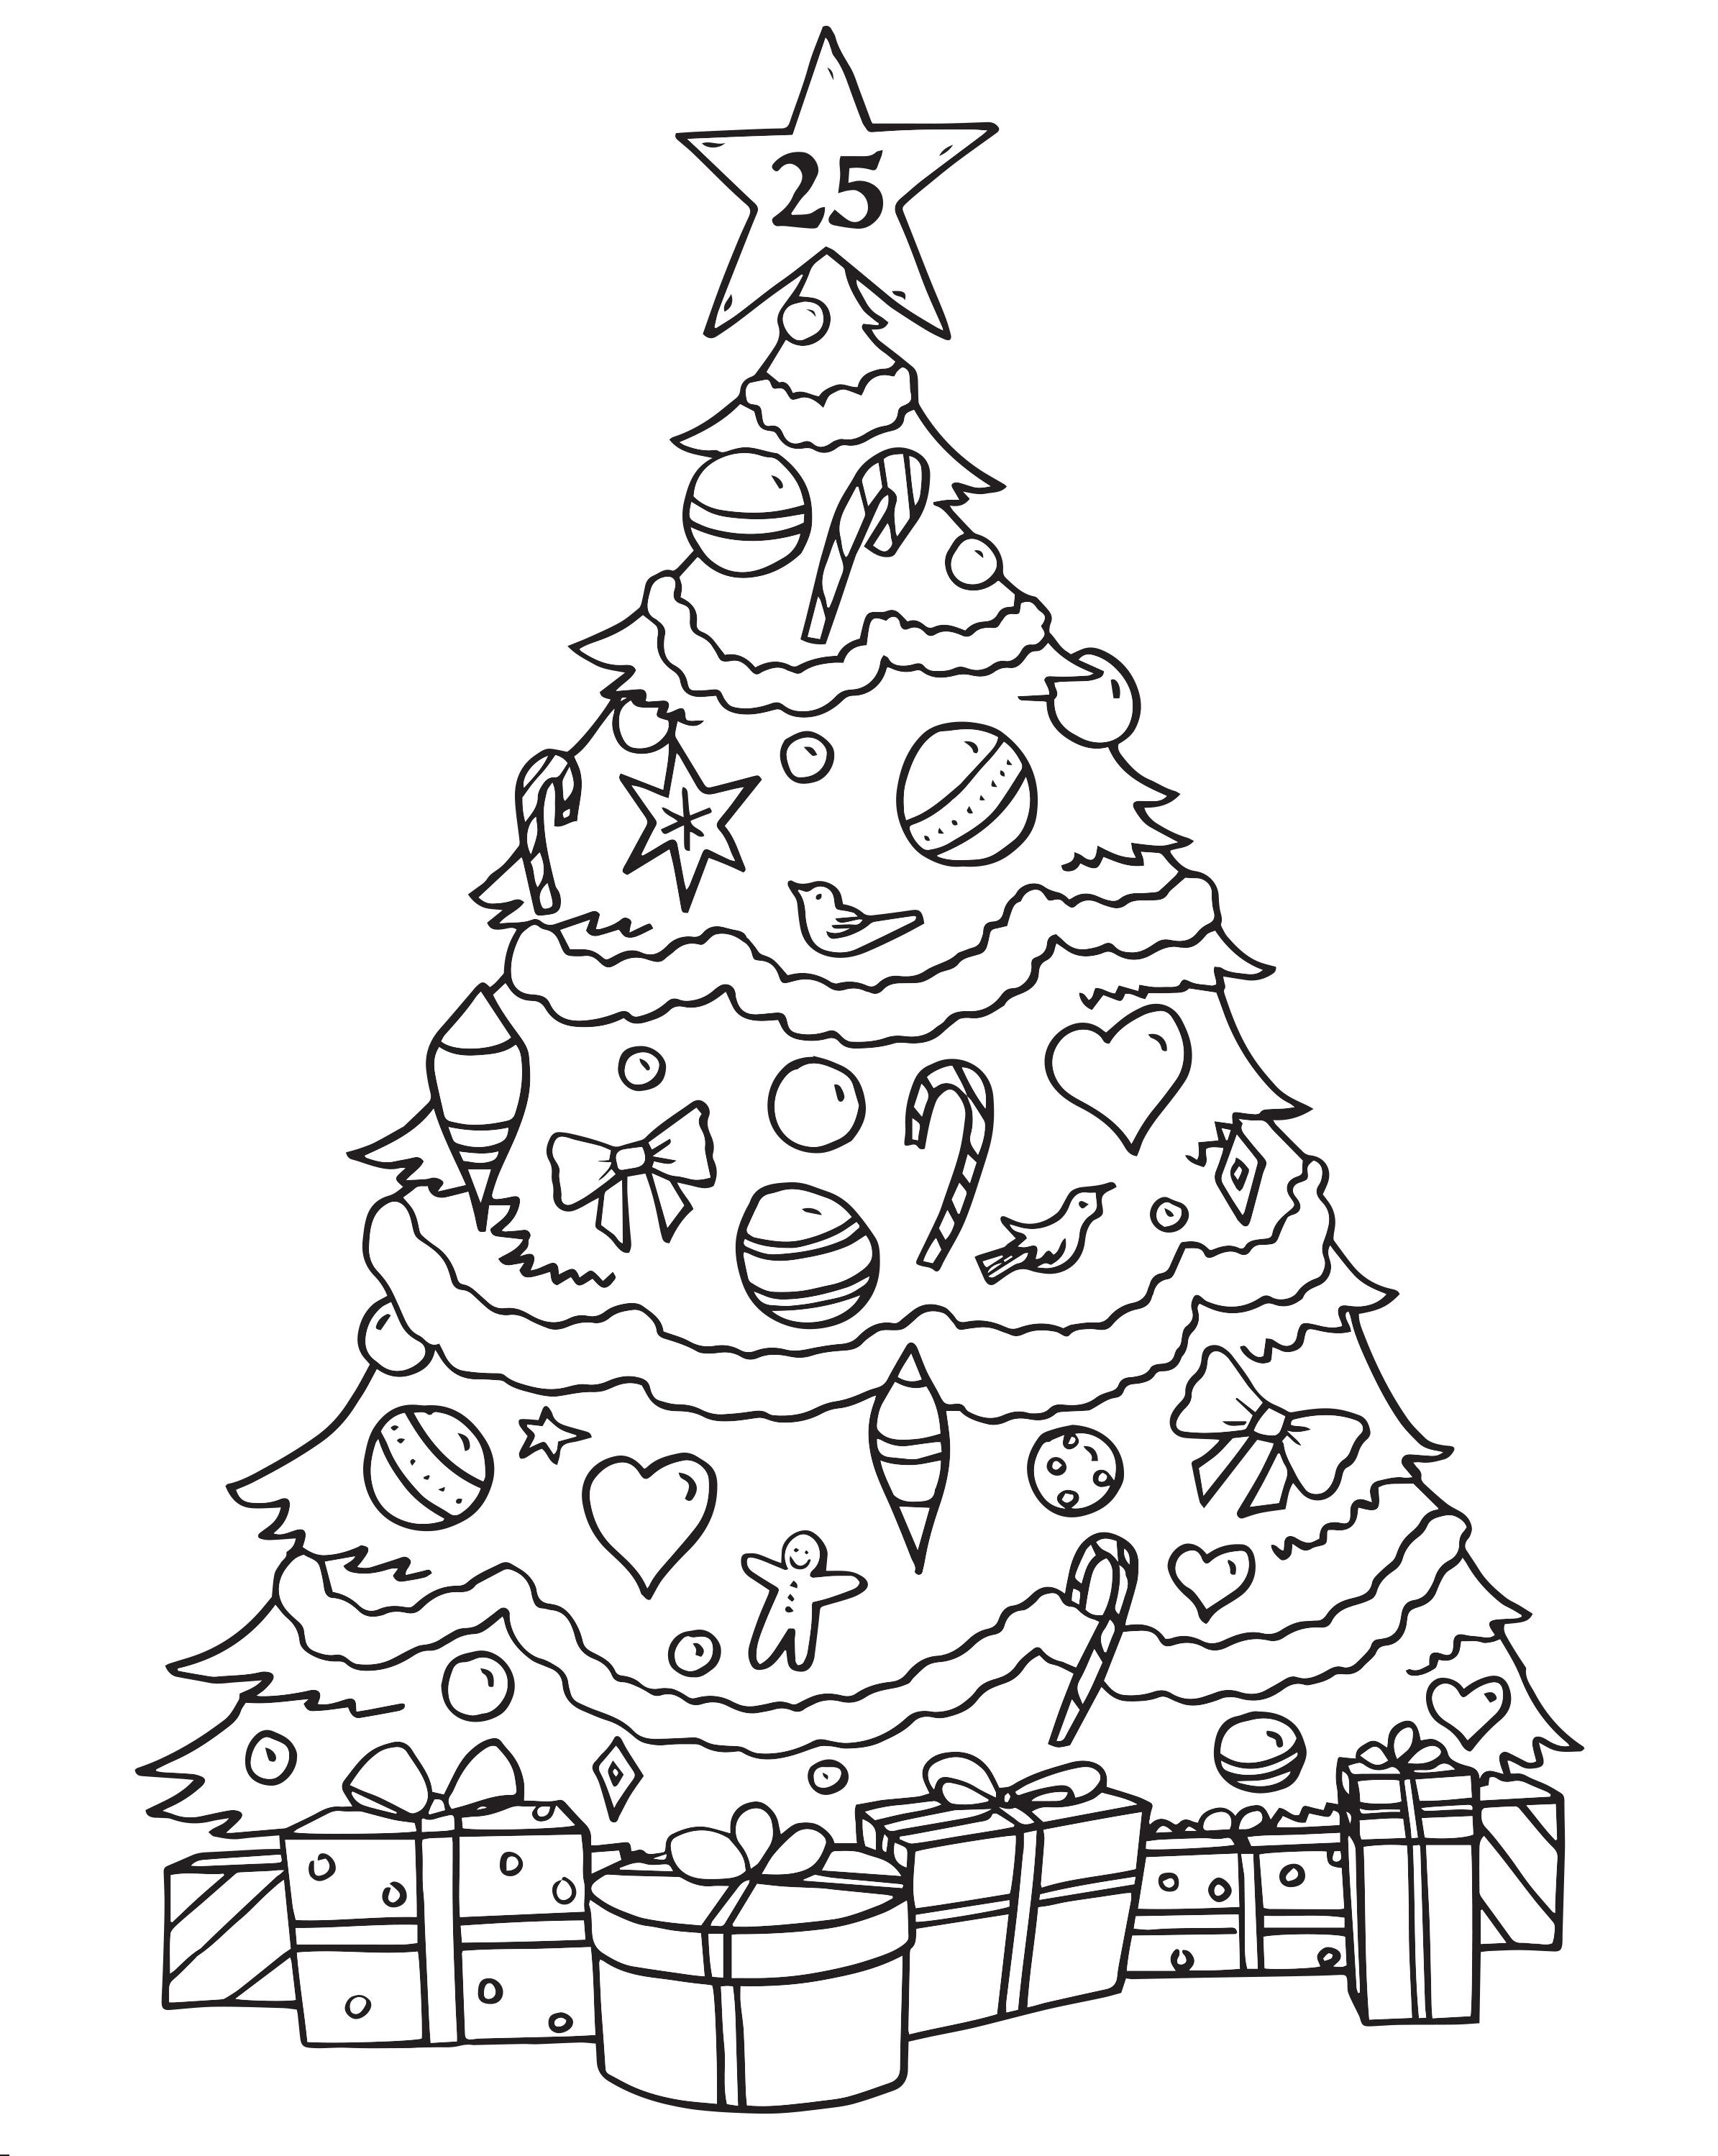 Advent Calendar Drawing at GetDrawings | Free download